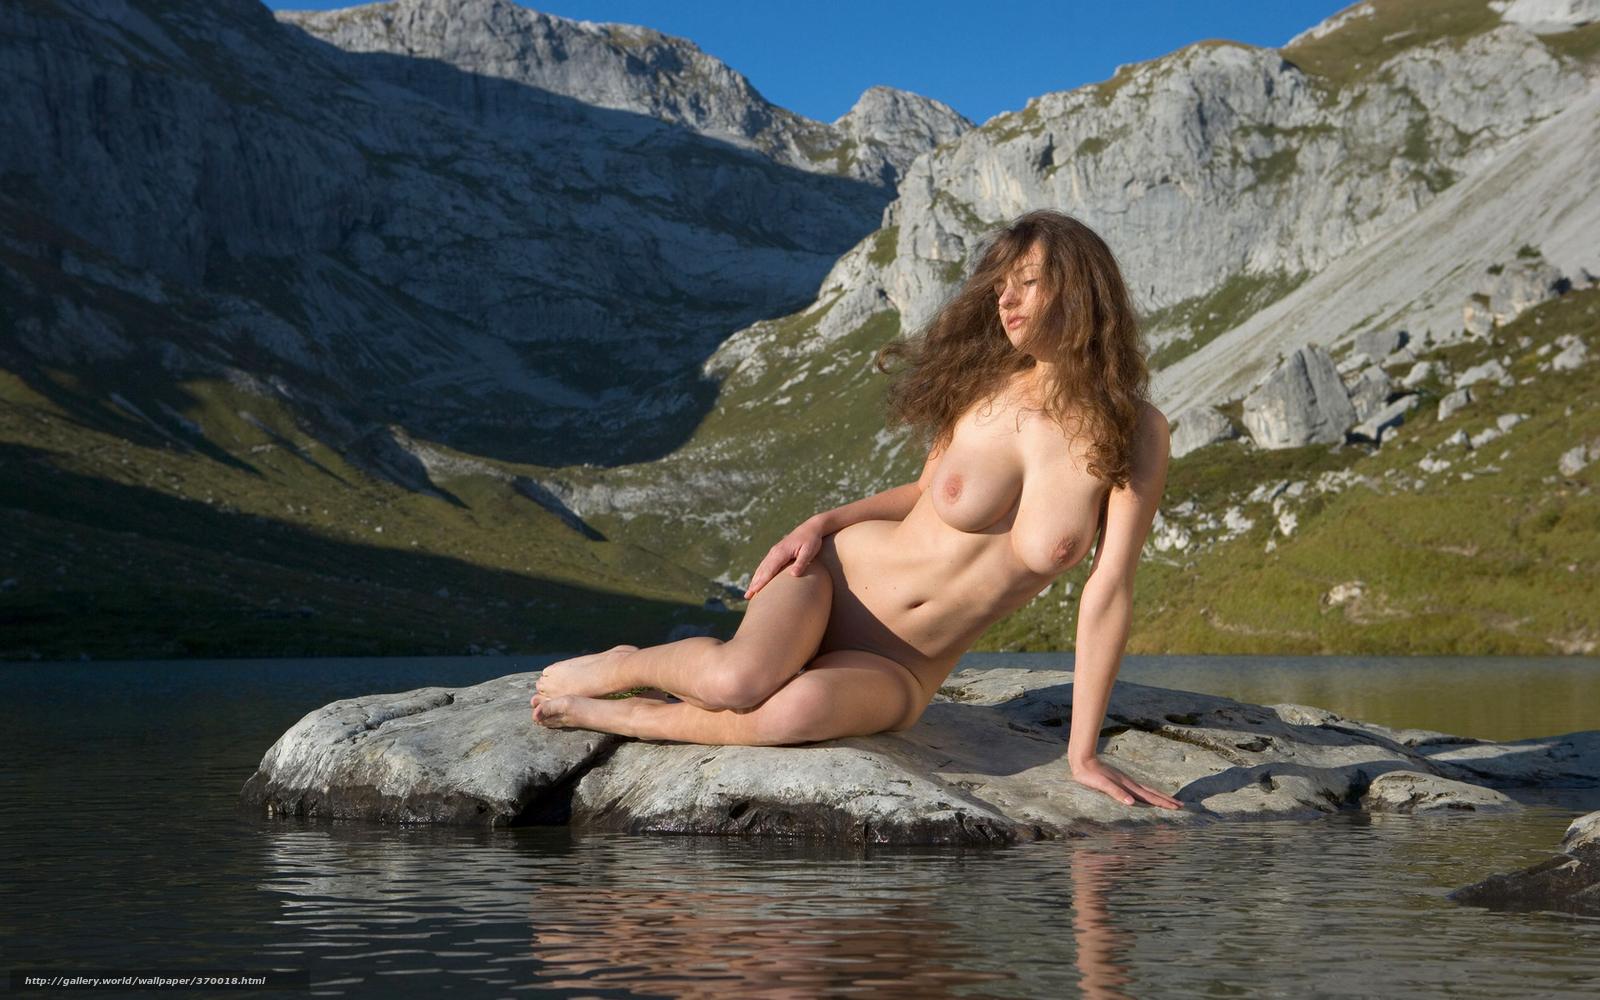 Фото озеро эро 17 фотография